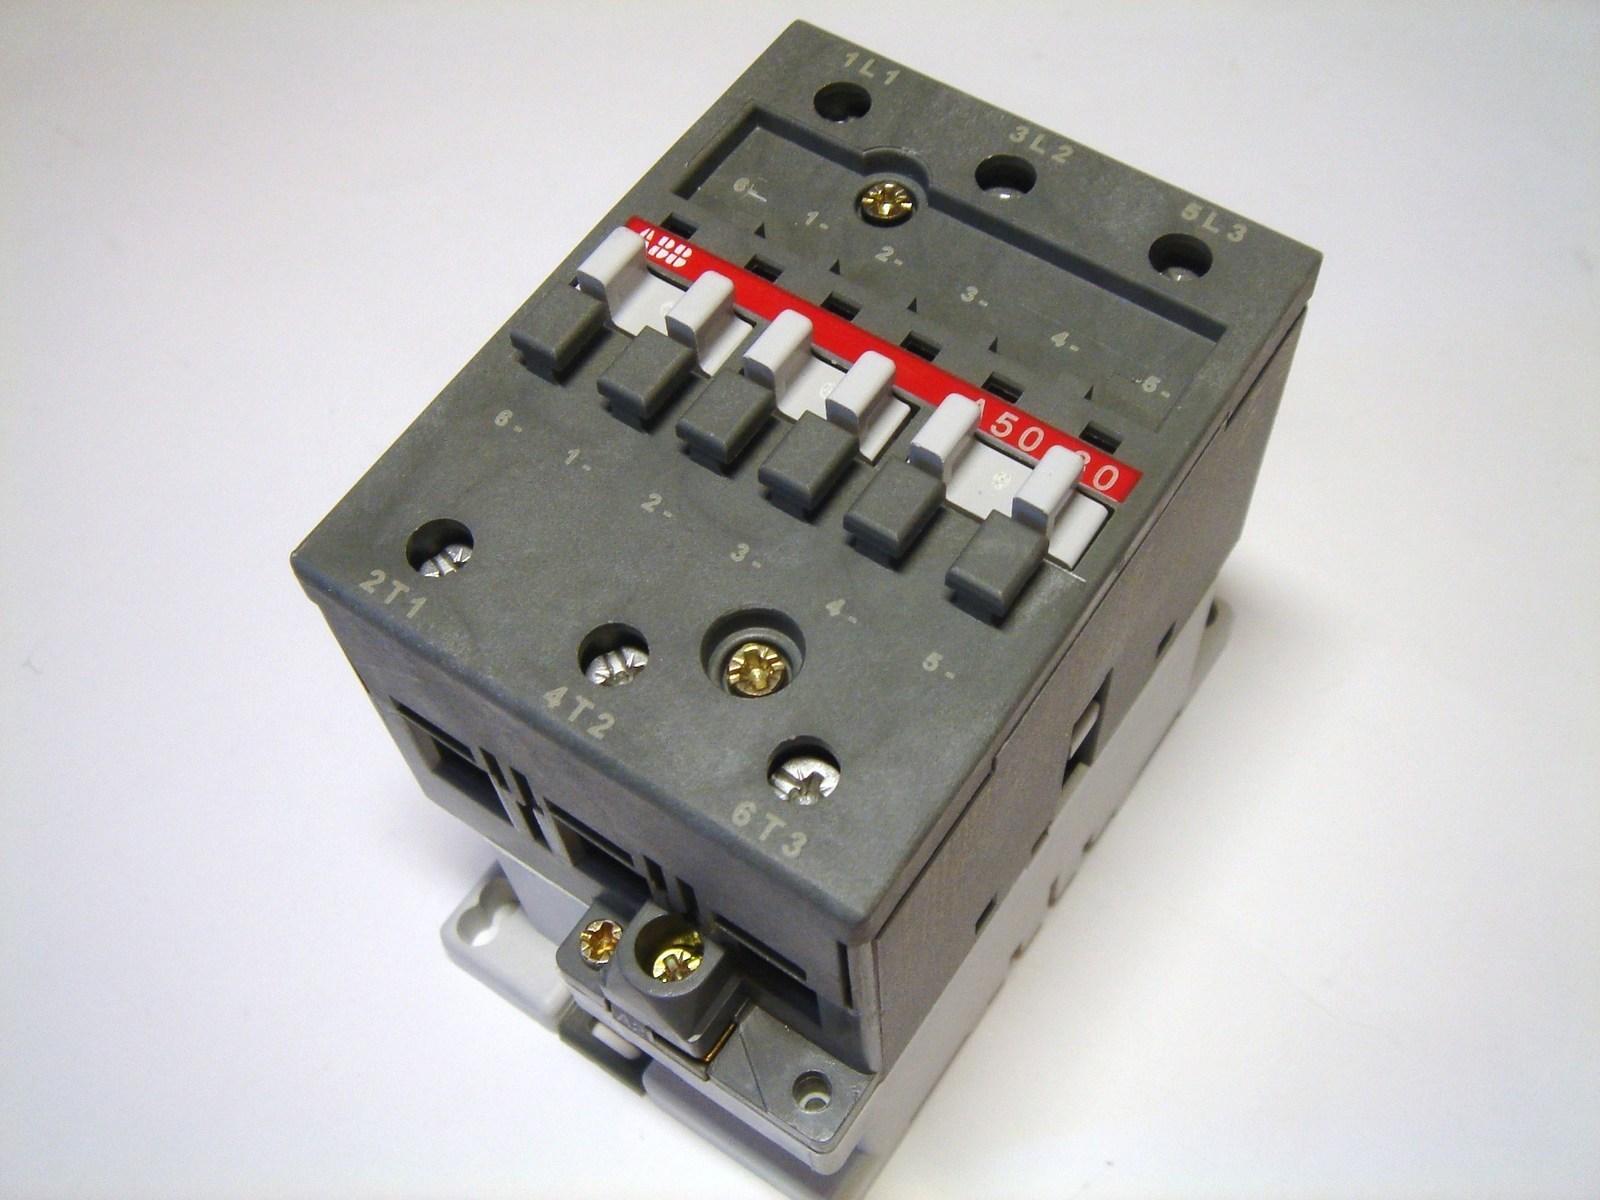 Kontaktor 3-faasiline 100A(64kW), A50-30-00, ABB, 1SBL351001R8000